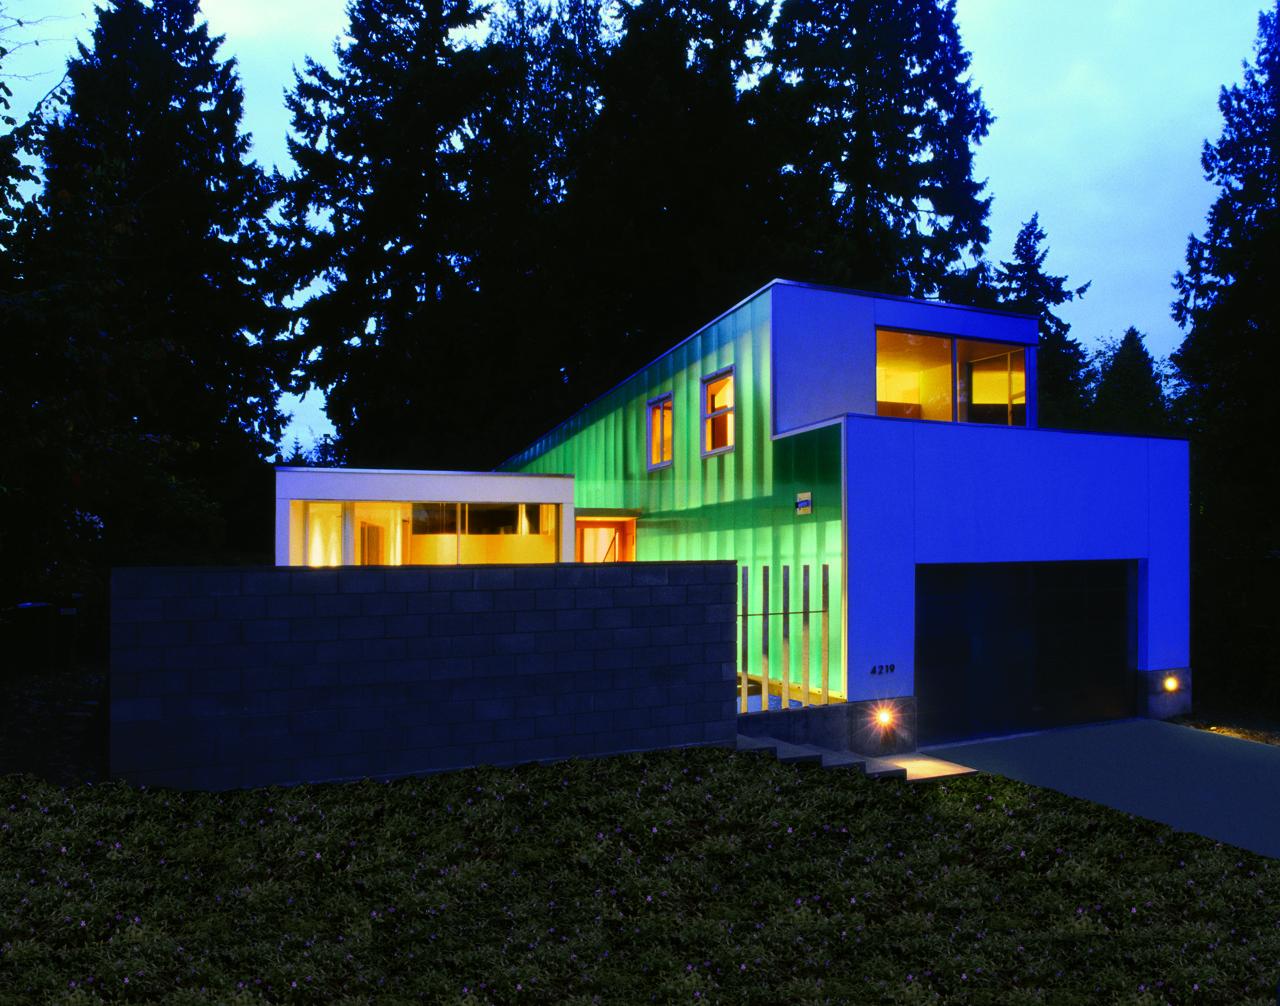 Zig Zag House / David Coleman, Courtesy of  david coleman architecture